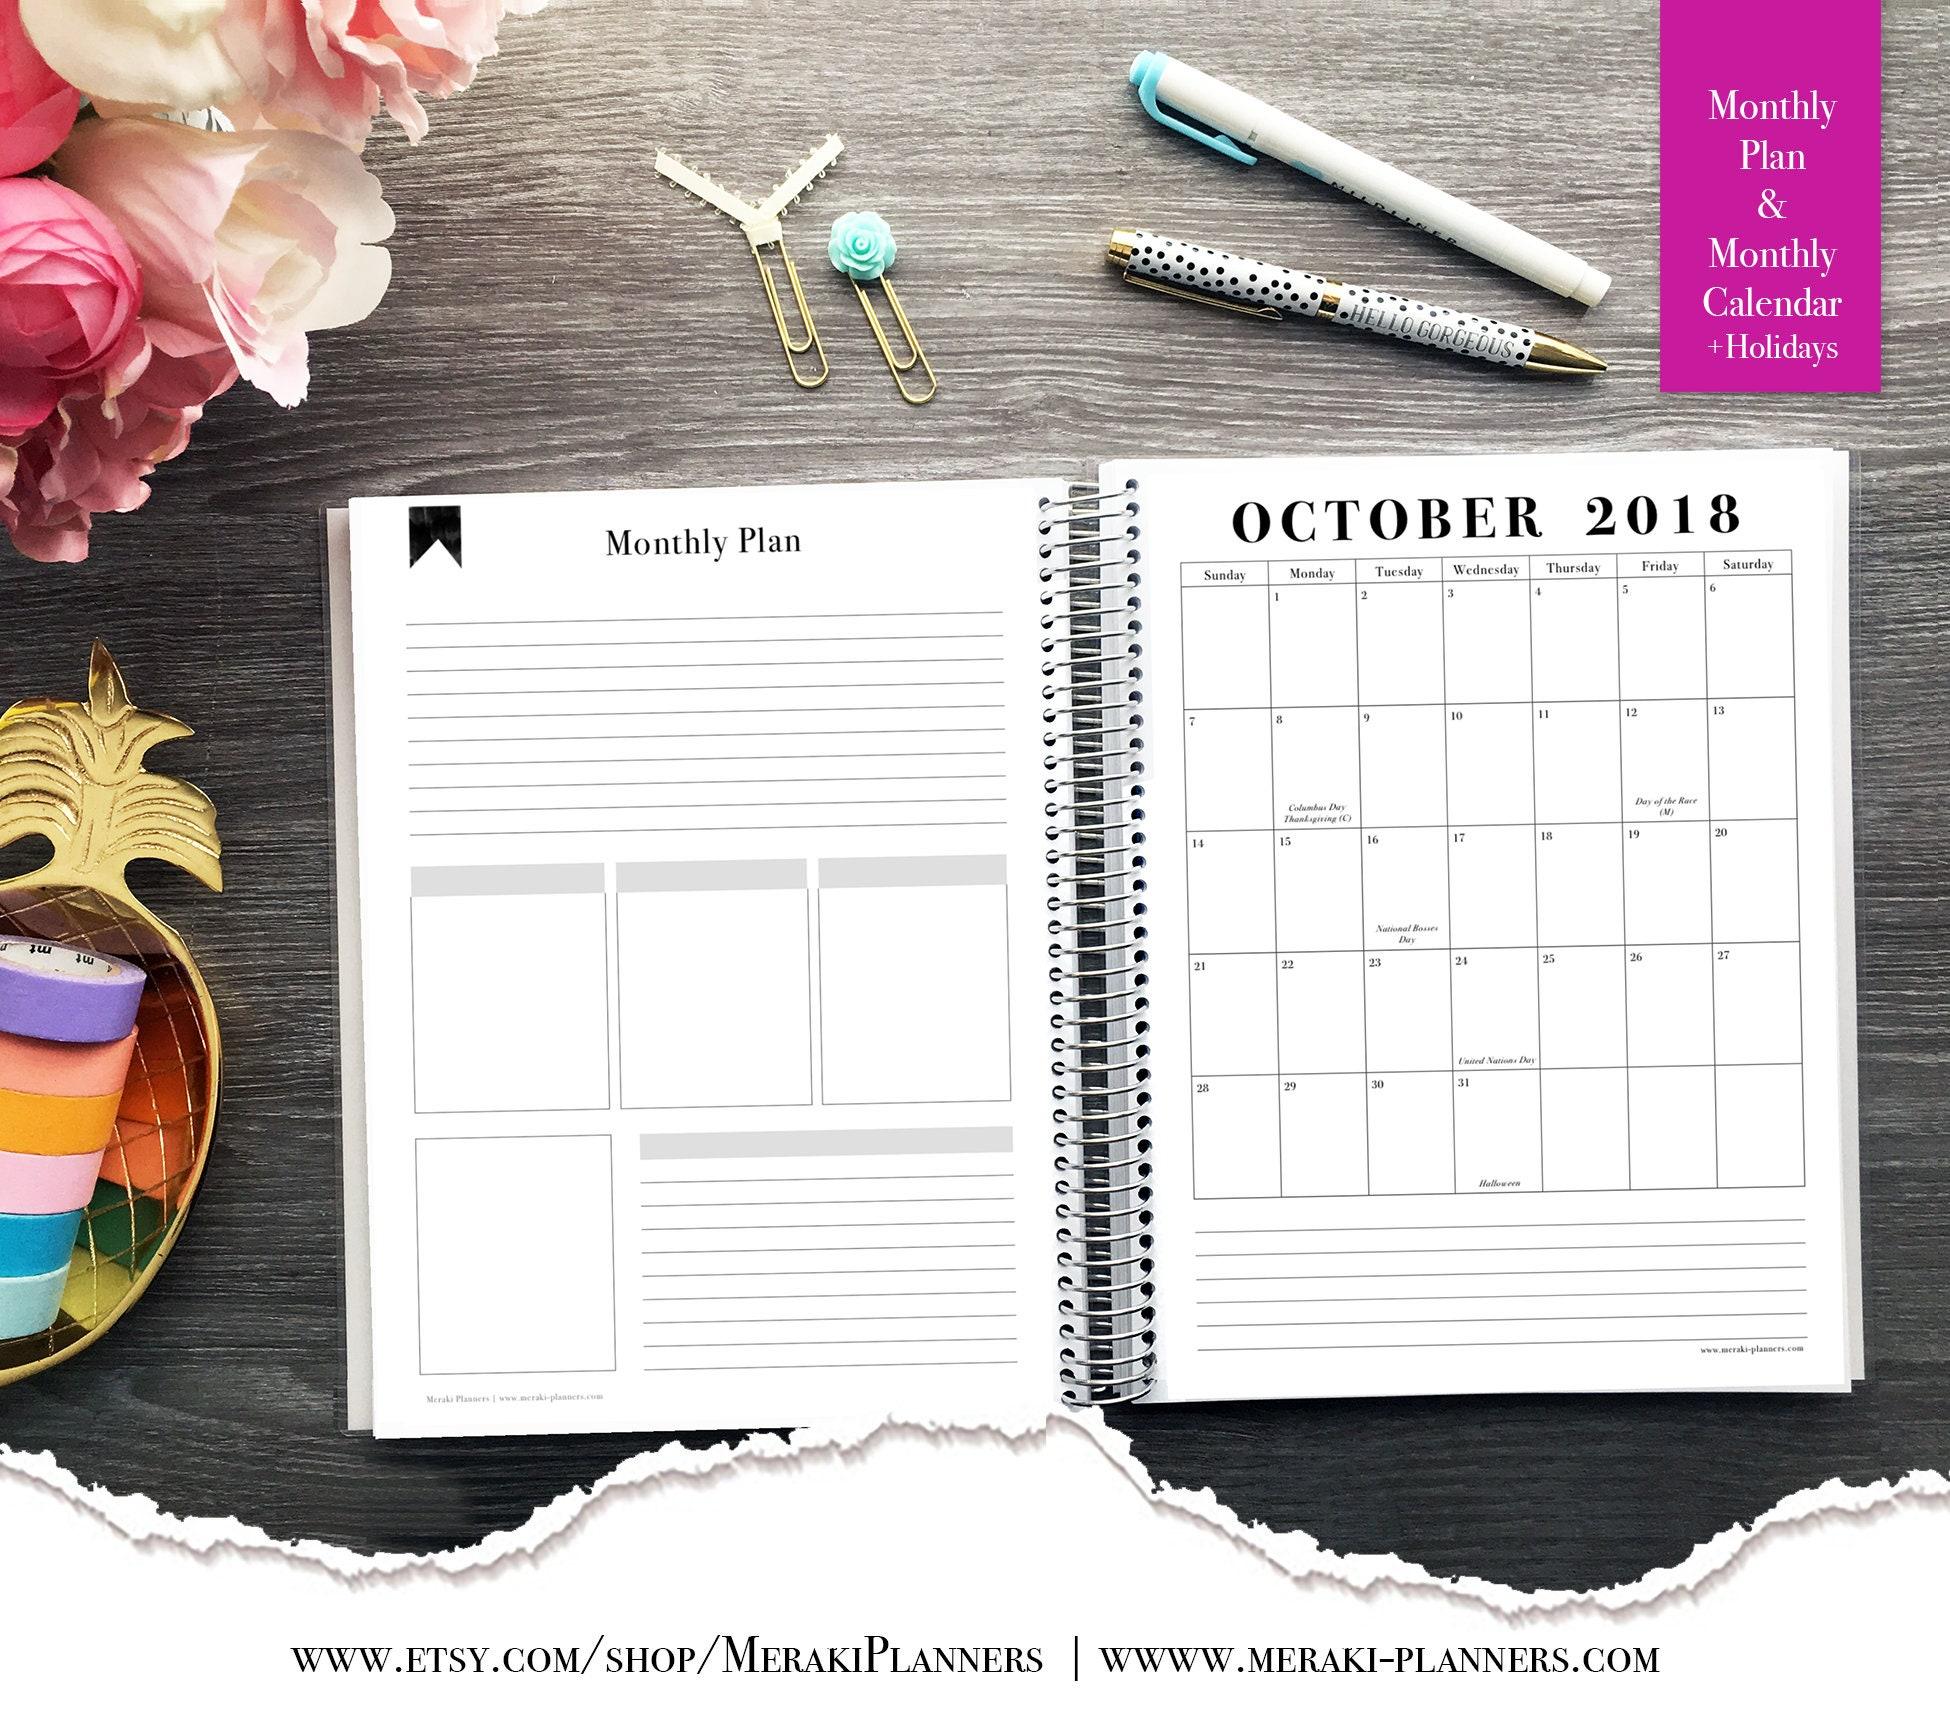 n e w meraki planners appointment book salon planner 15 minute